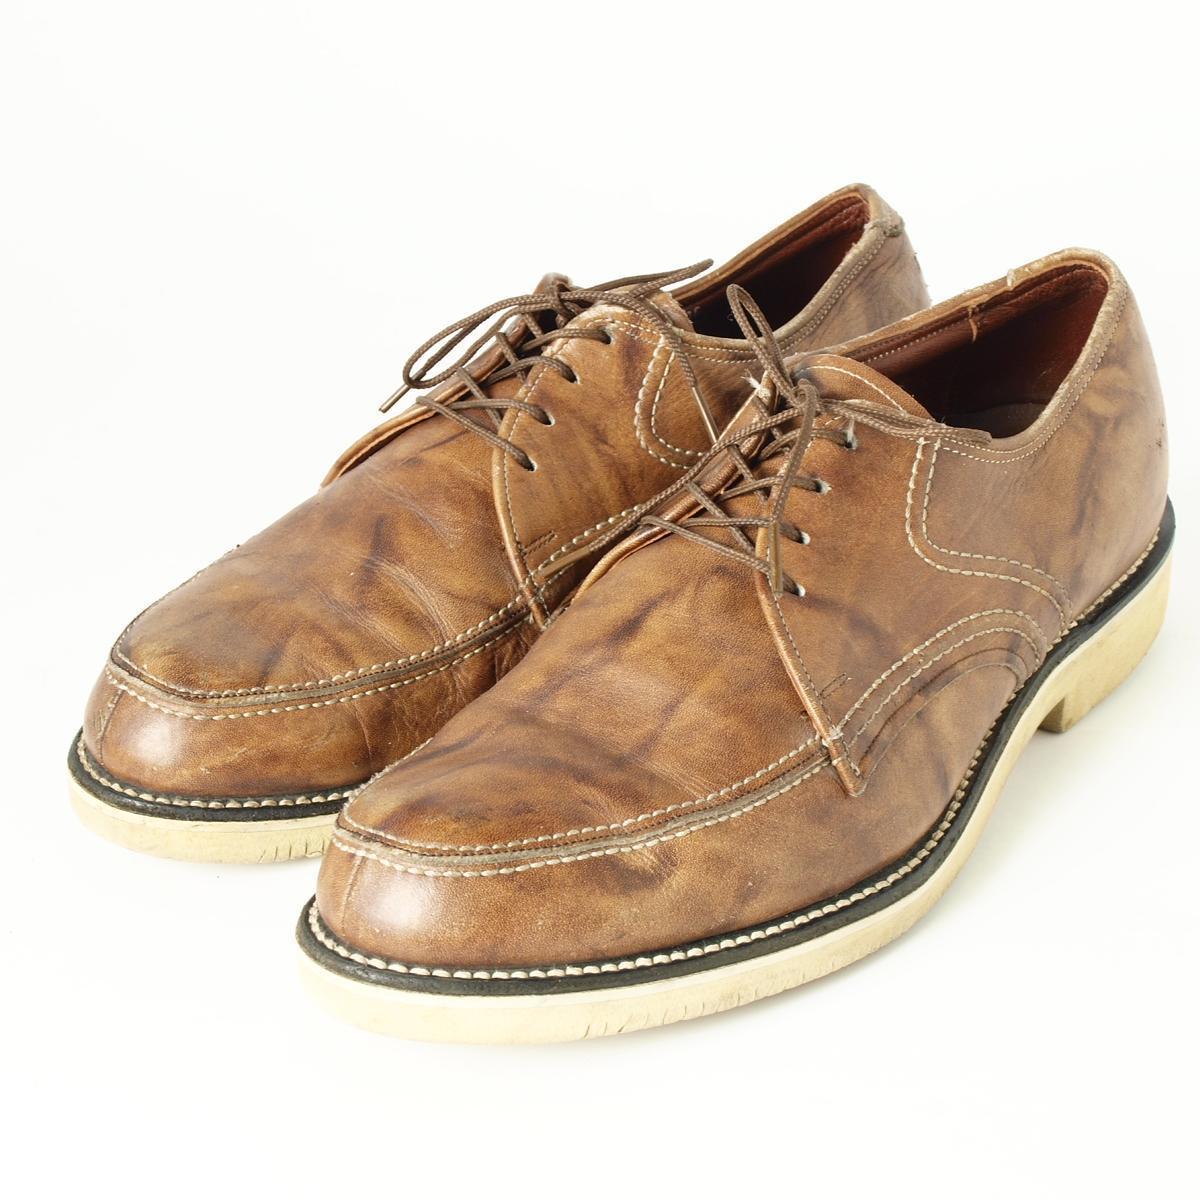 FOOT SO PORT shoes USA製 Uチップシューズ 9EE メンズ27.0cm ヴィンテージ /boi4574 【古着屋JAM】【中古】 160318【532P19Apr16】